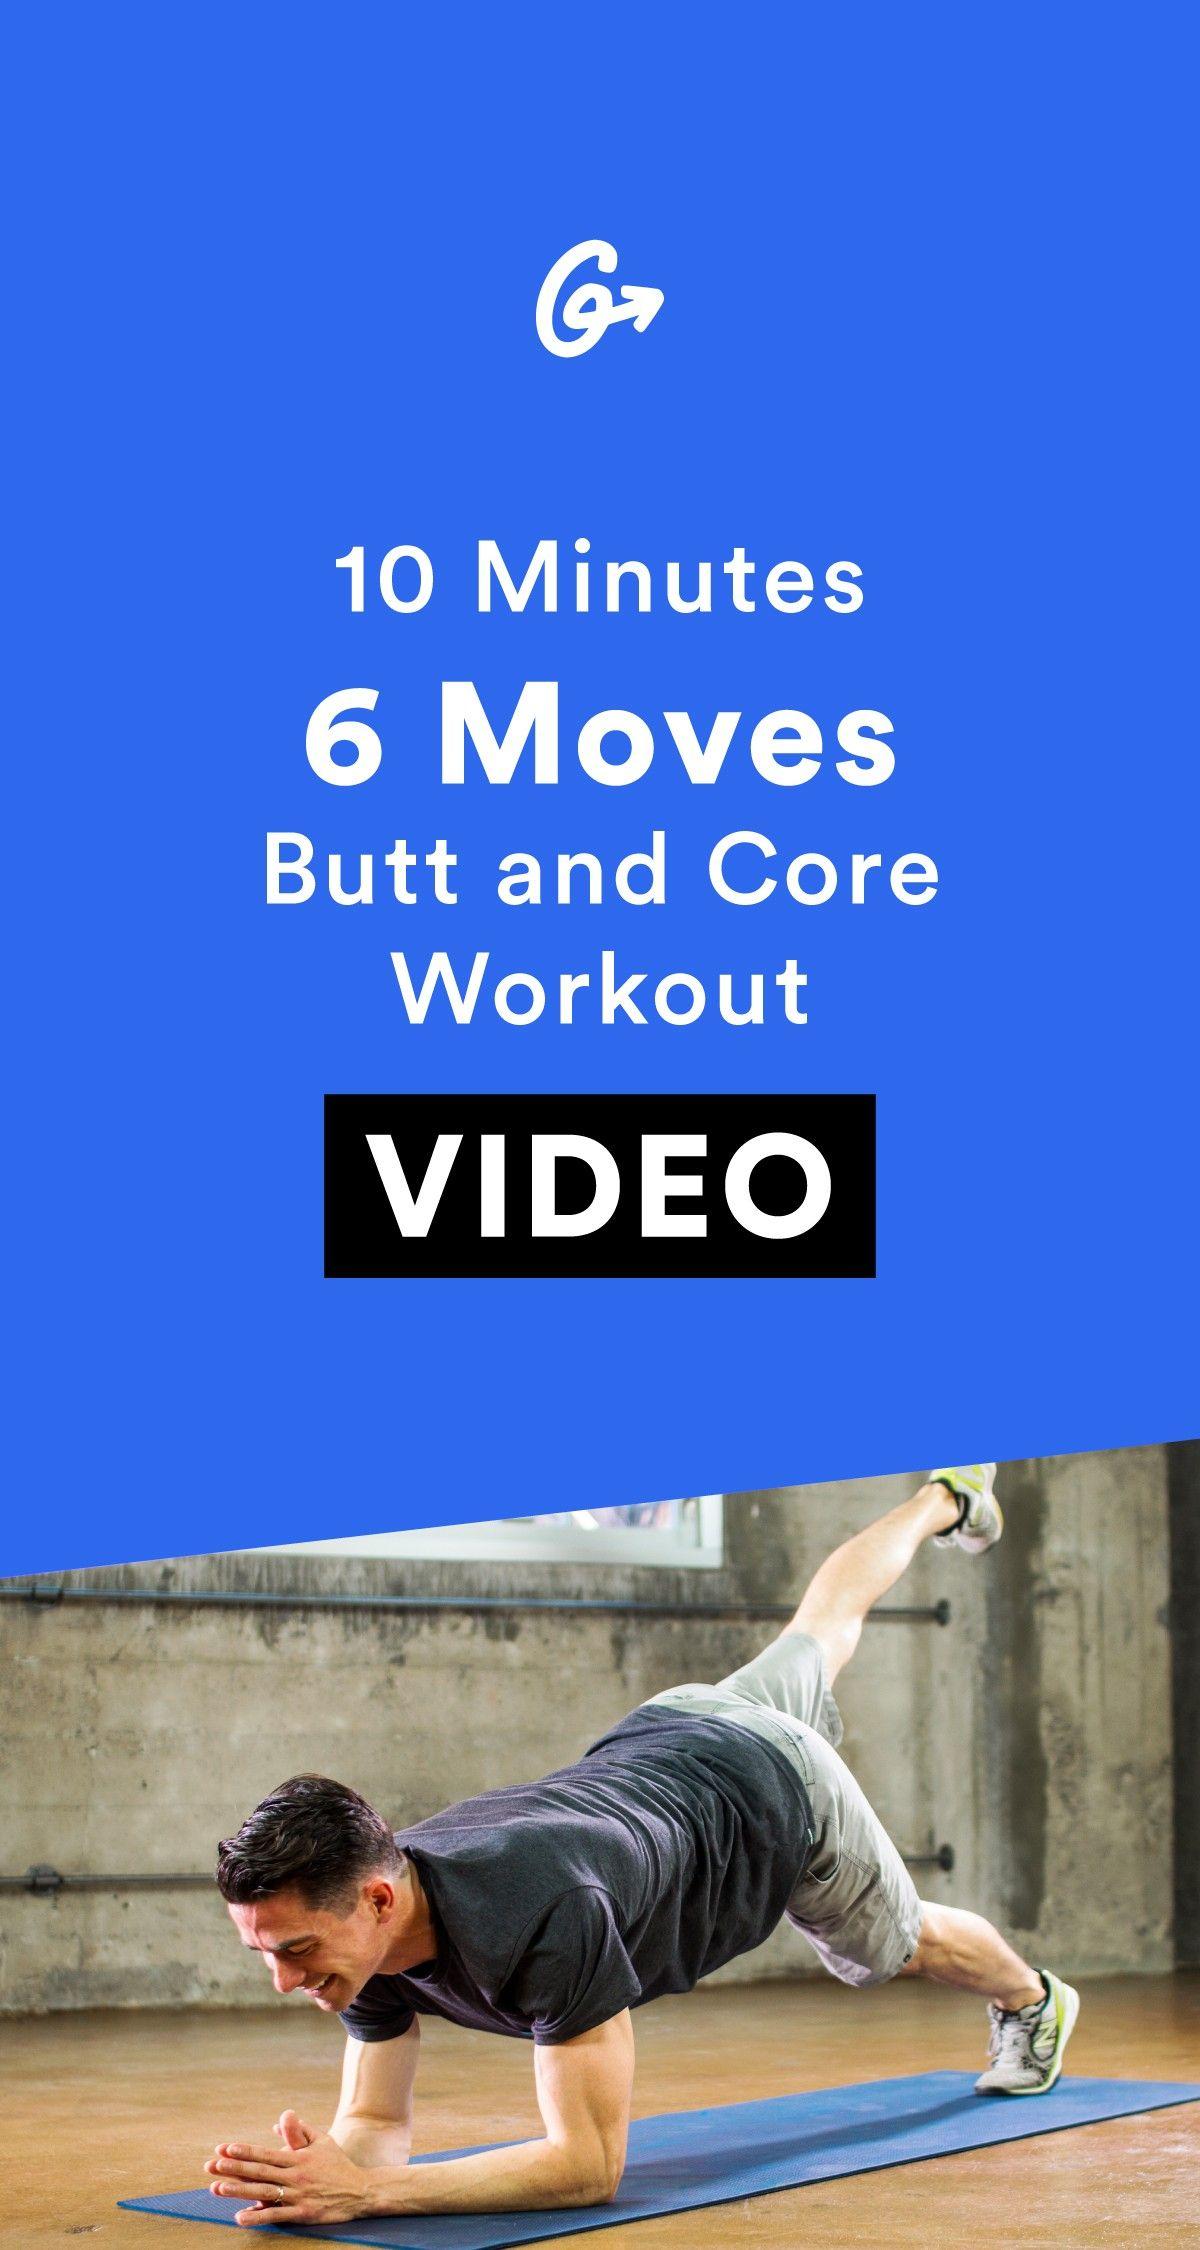 Everyone's got 10 minutes. #greatist https://greatist.com/move